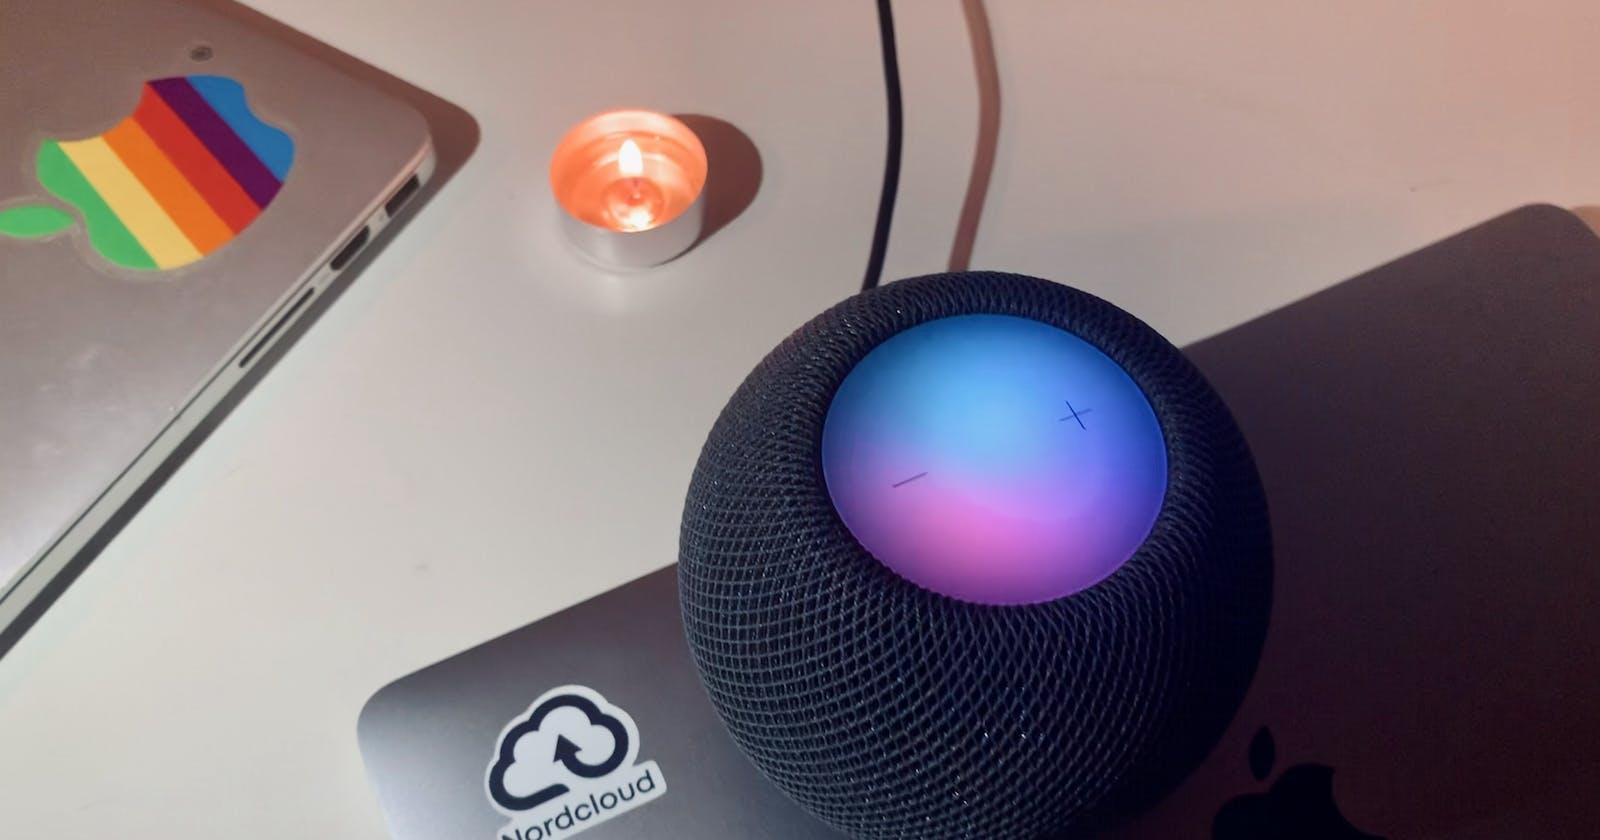 HOME02 - My Smart Home's Cloud integration